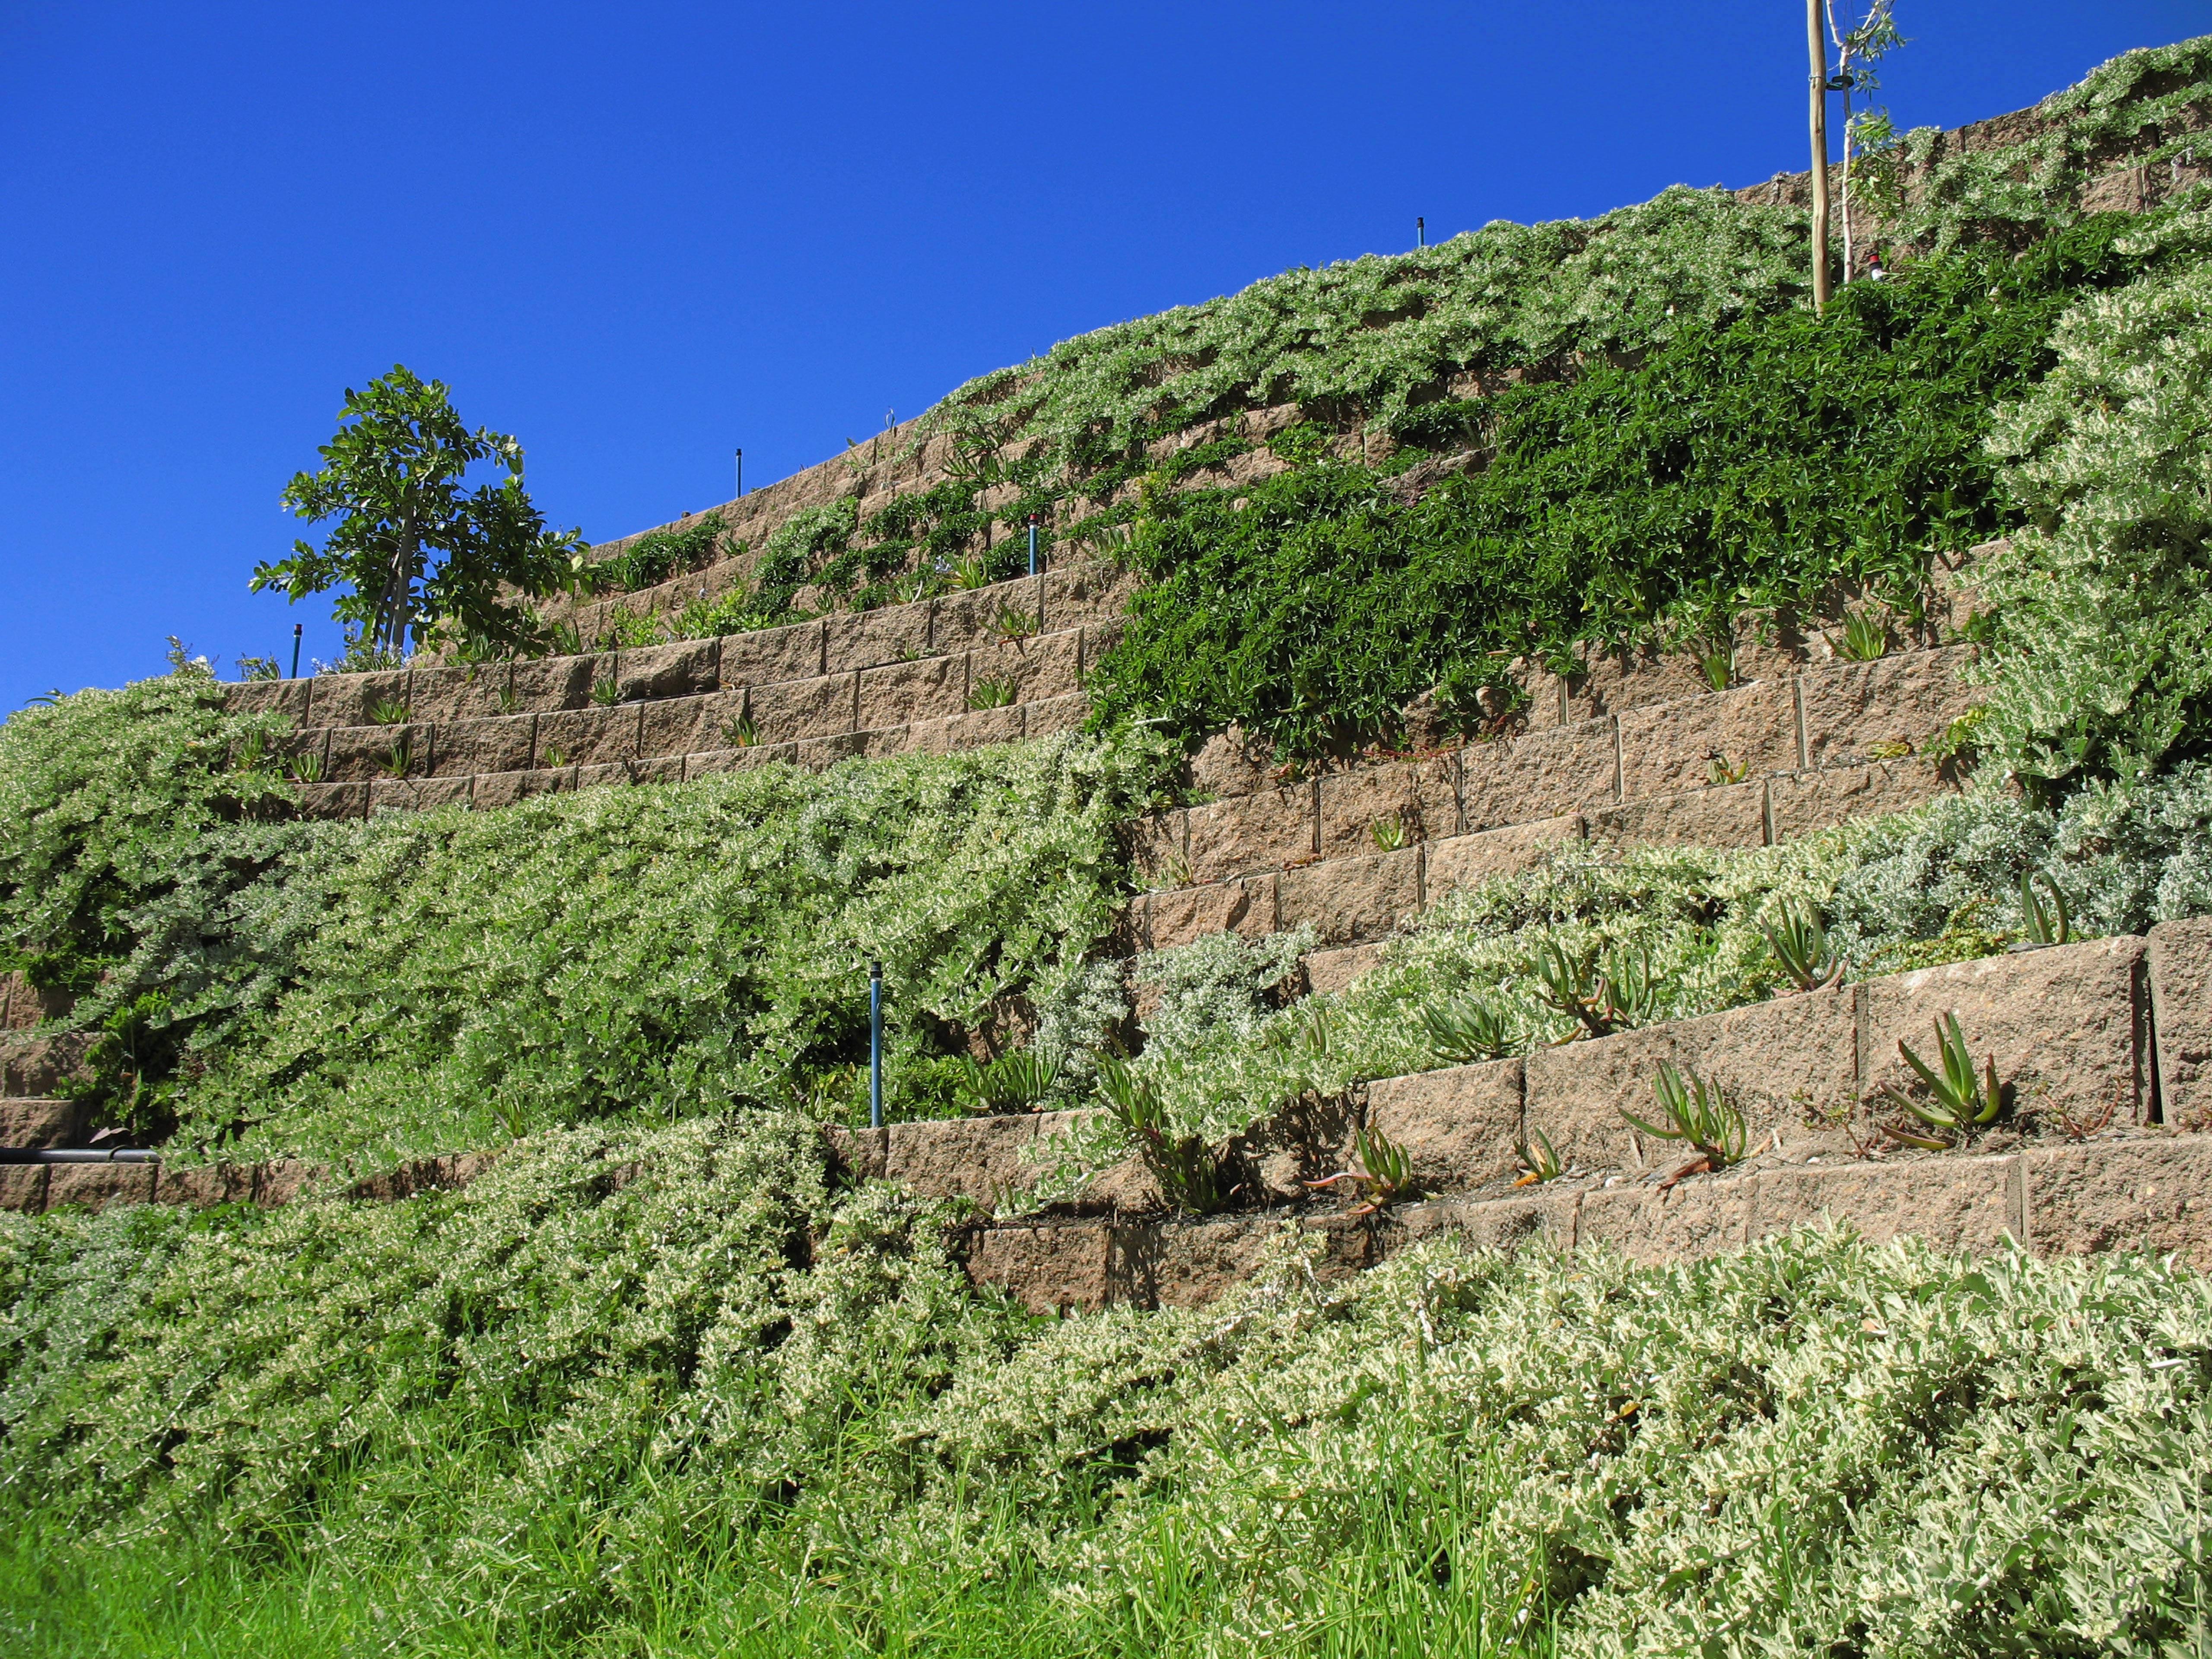 Hardy plant varieties prevent wind erosion